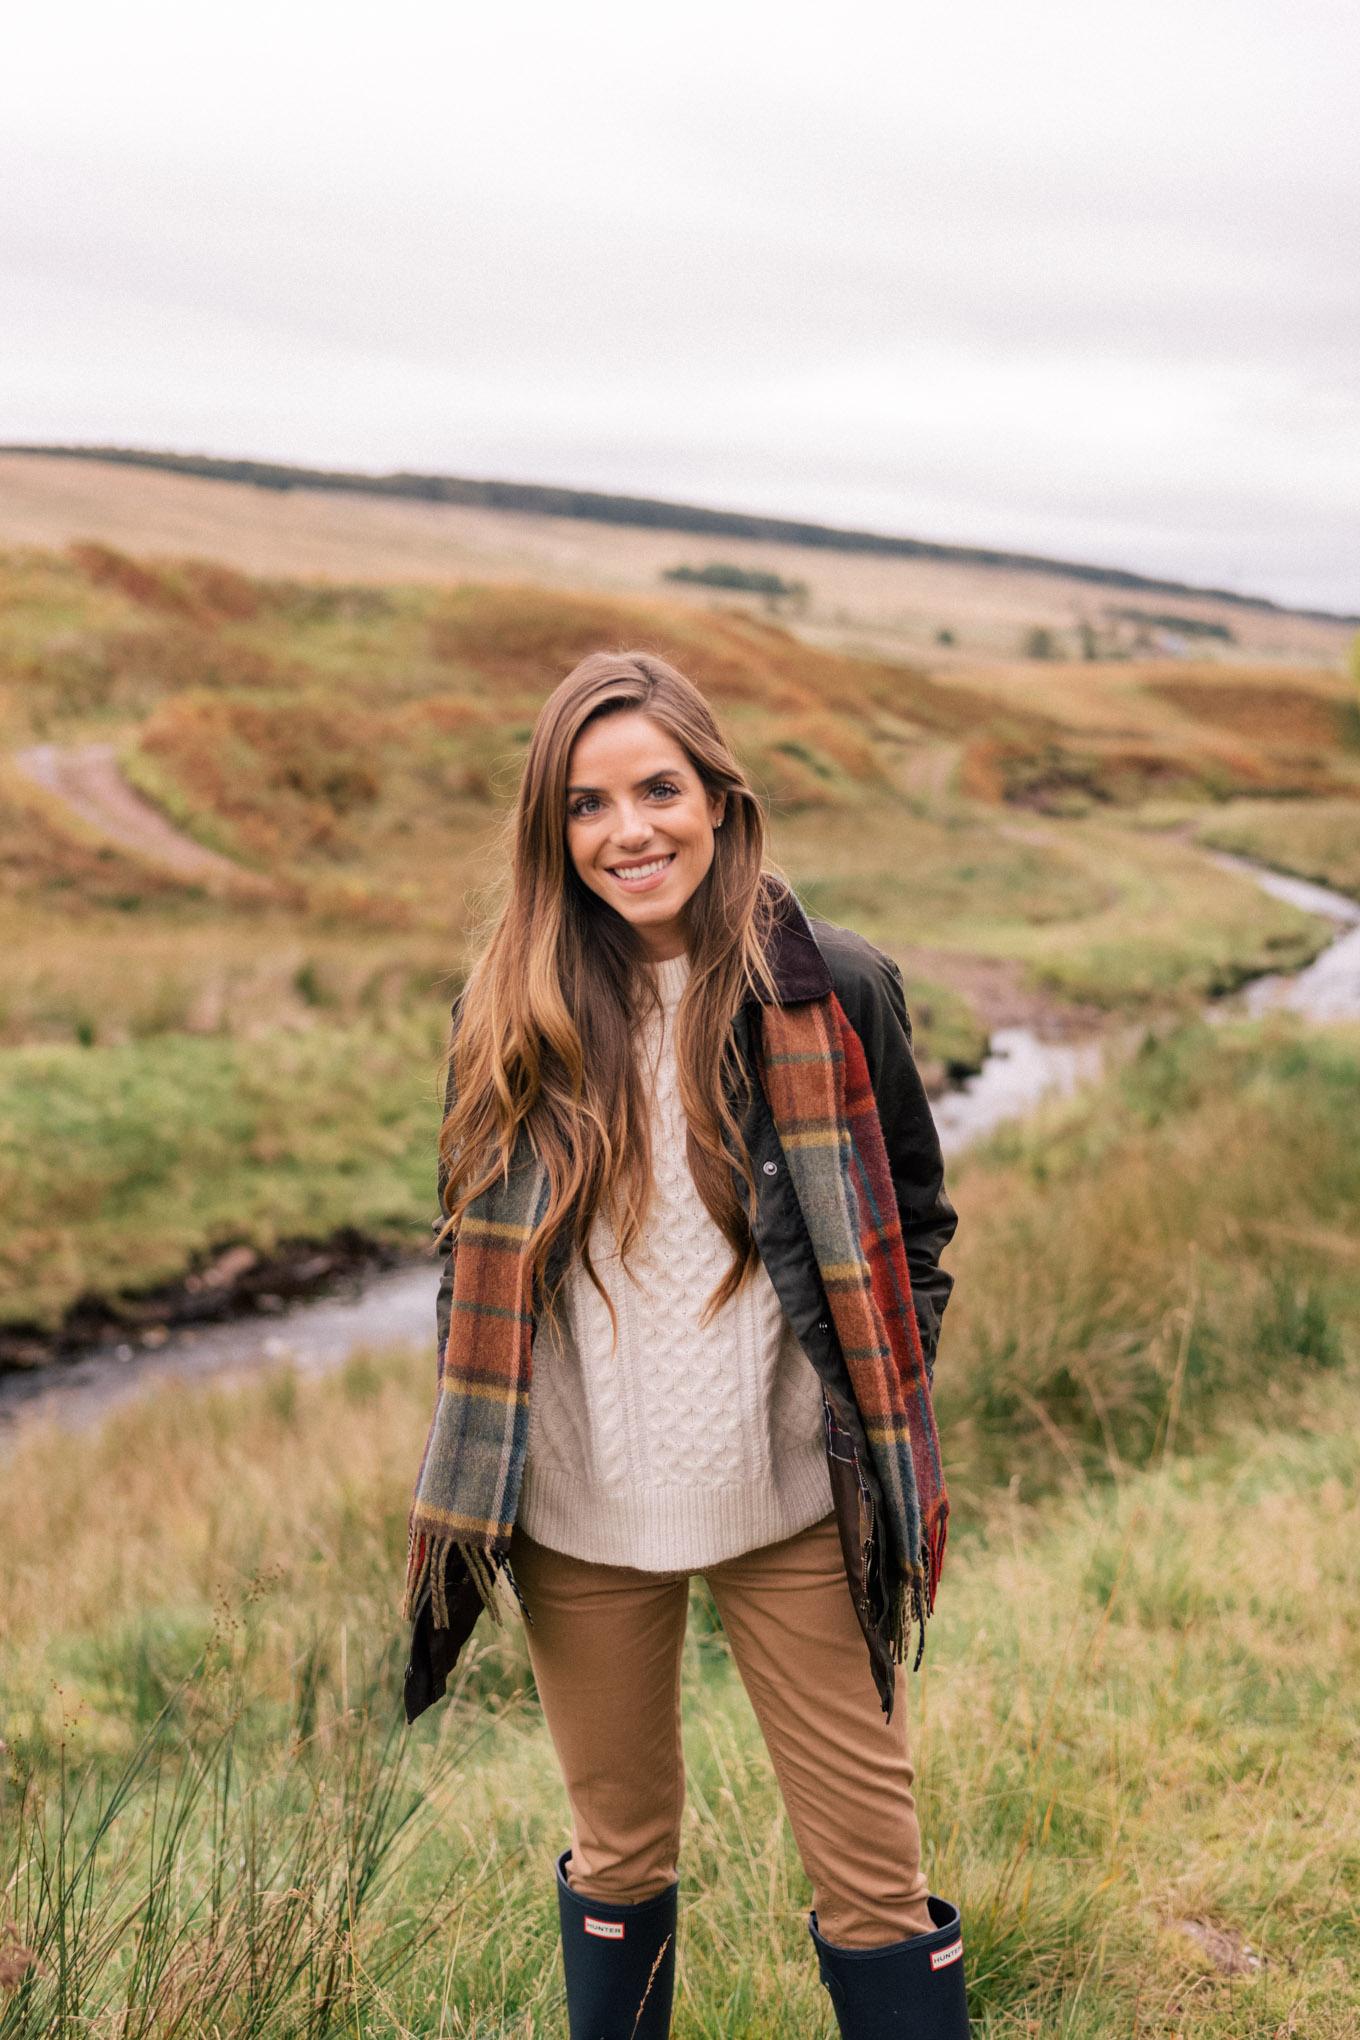 gmg-scotland-fall-trip- gleneagles-1005692